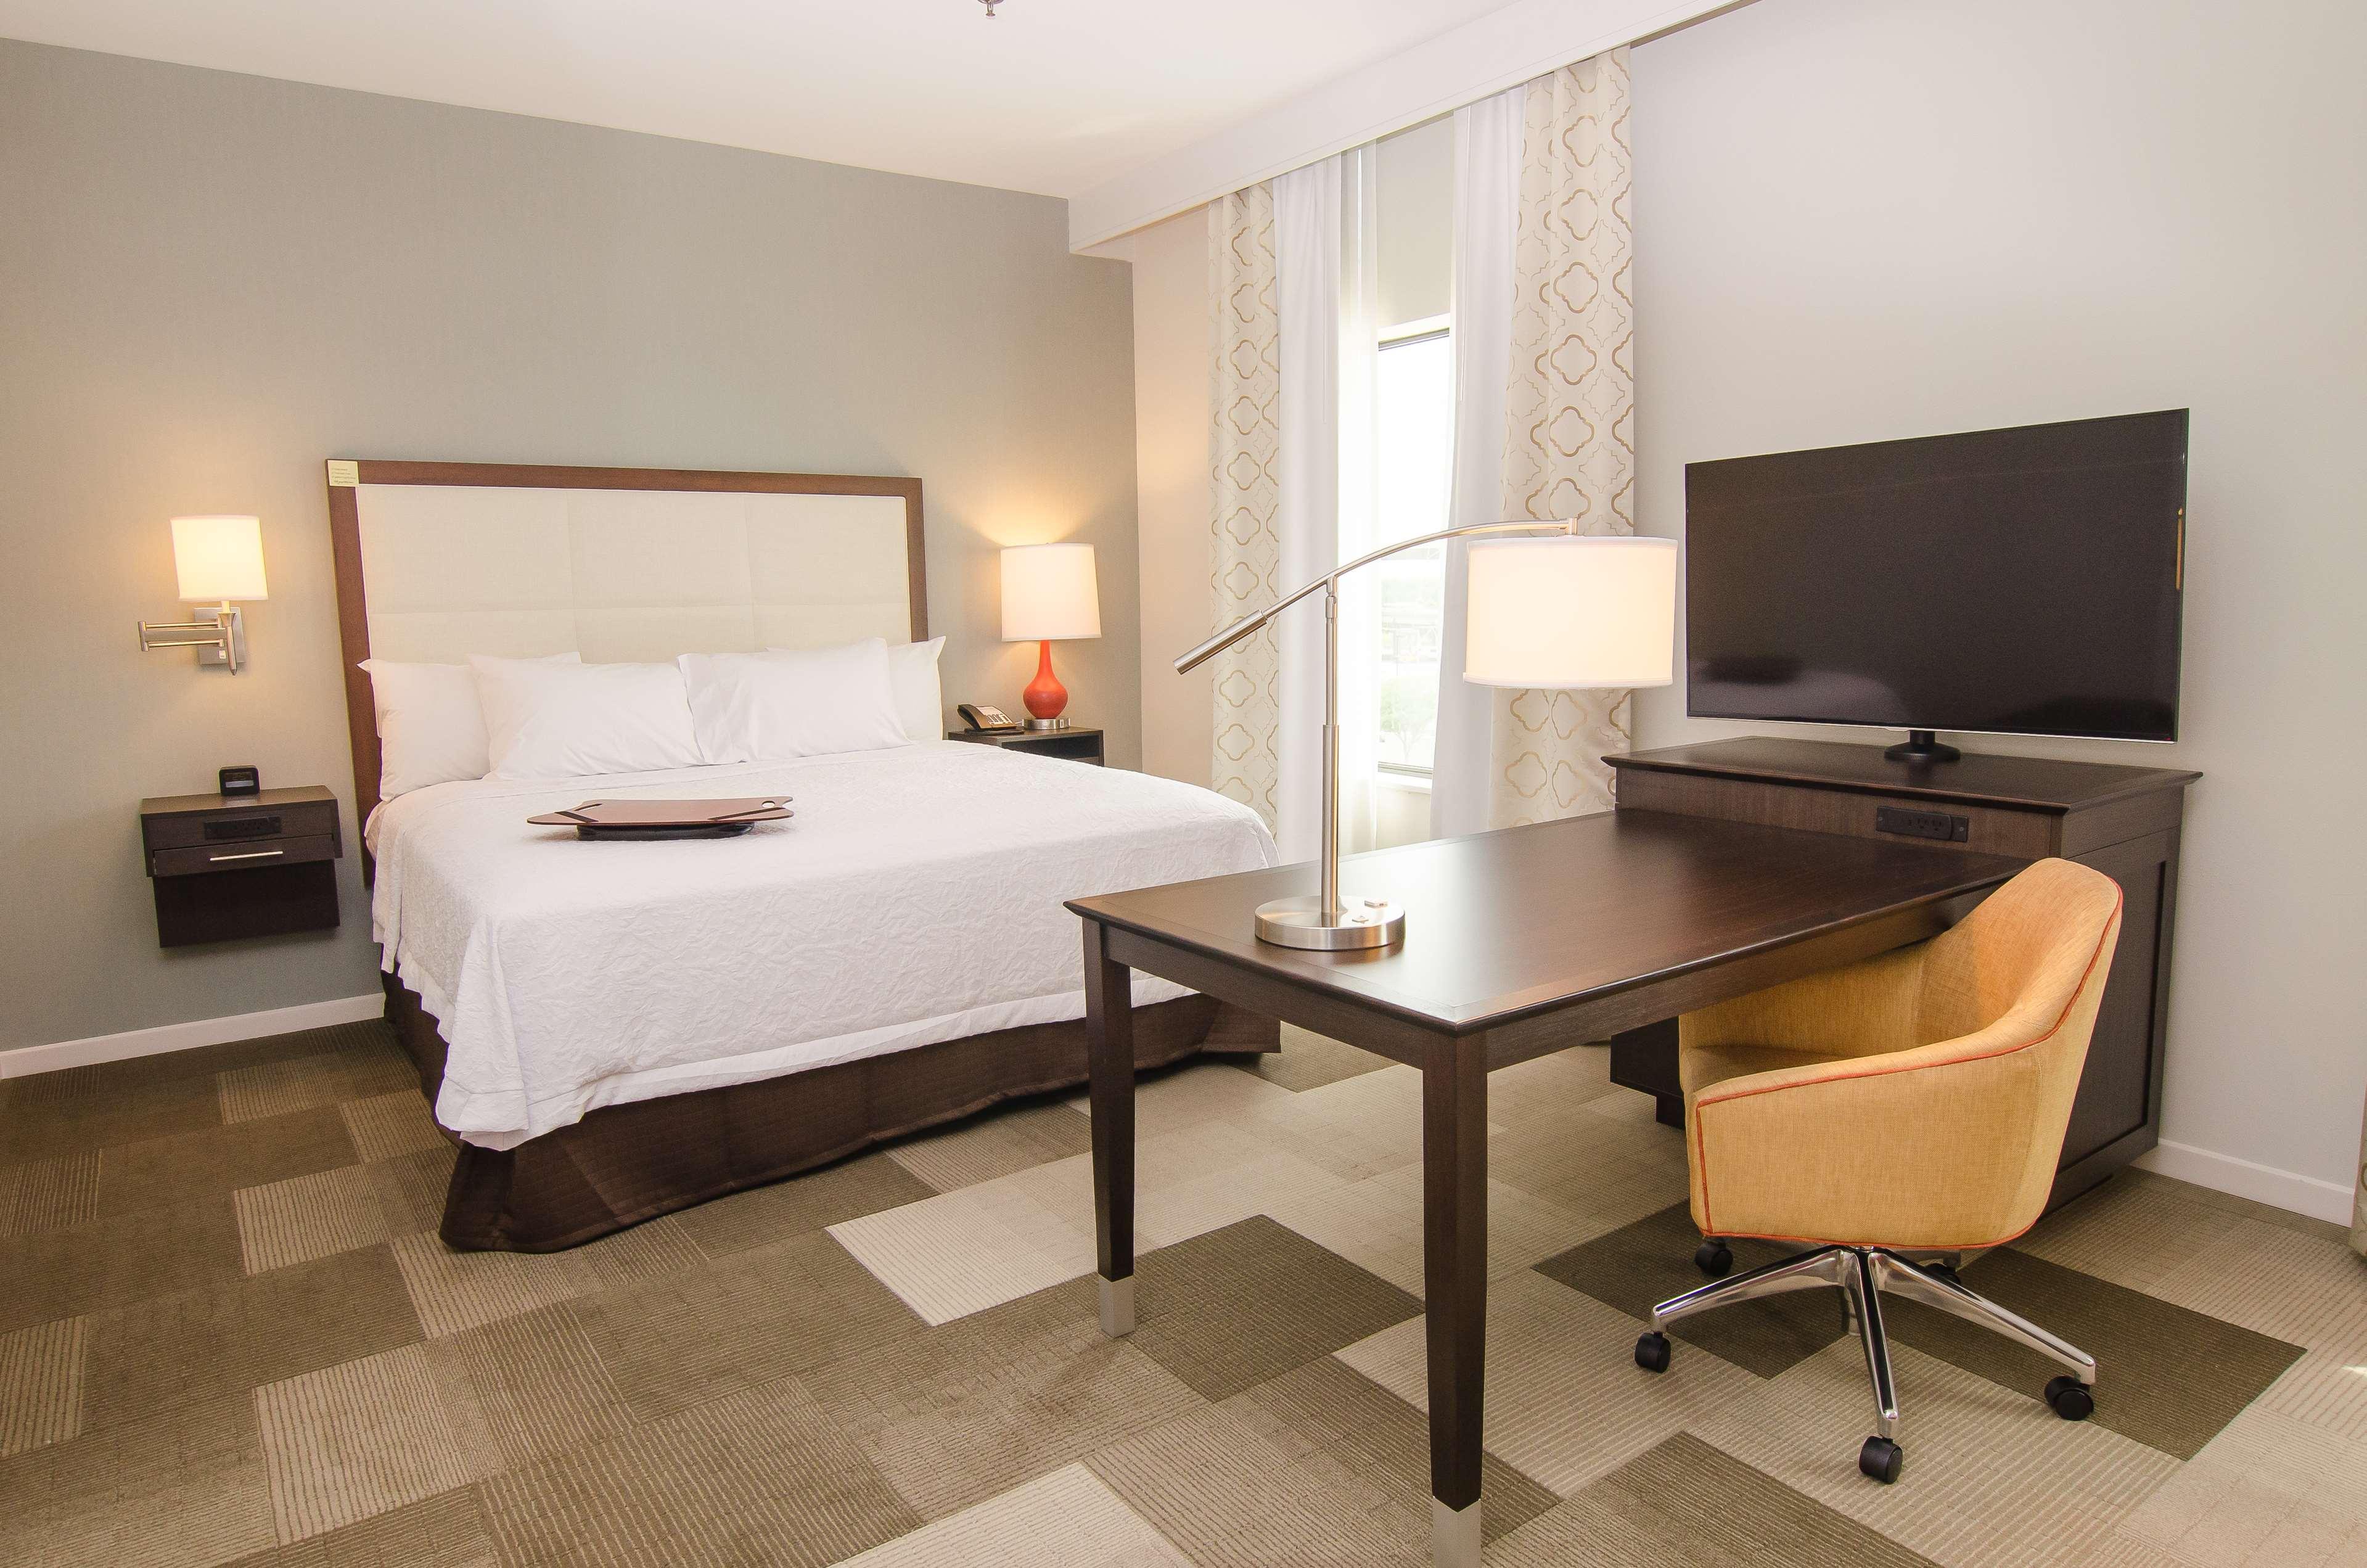 Hampton Inn & Suites Houston North IAH image 14